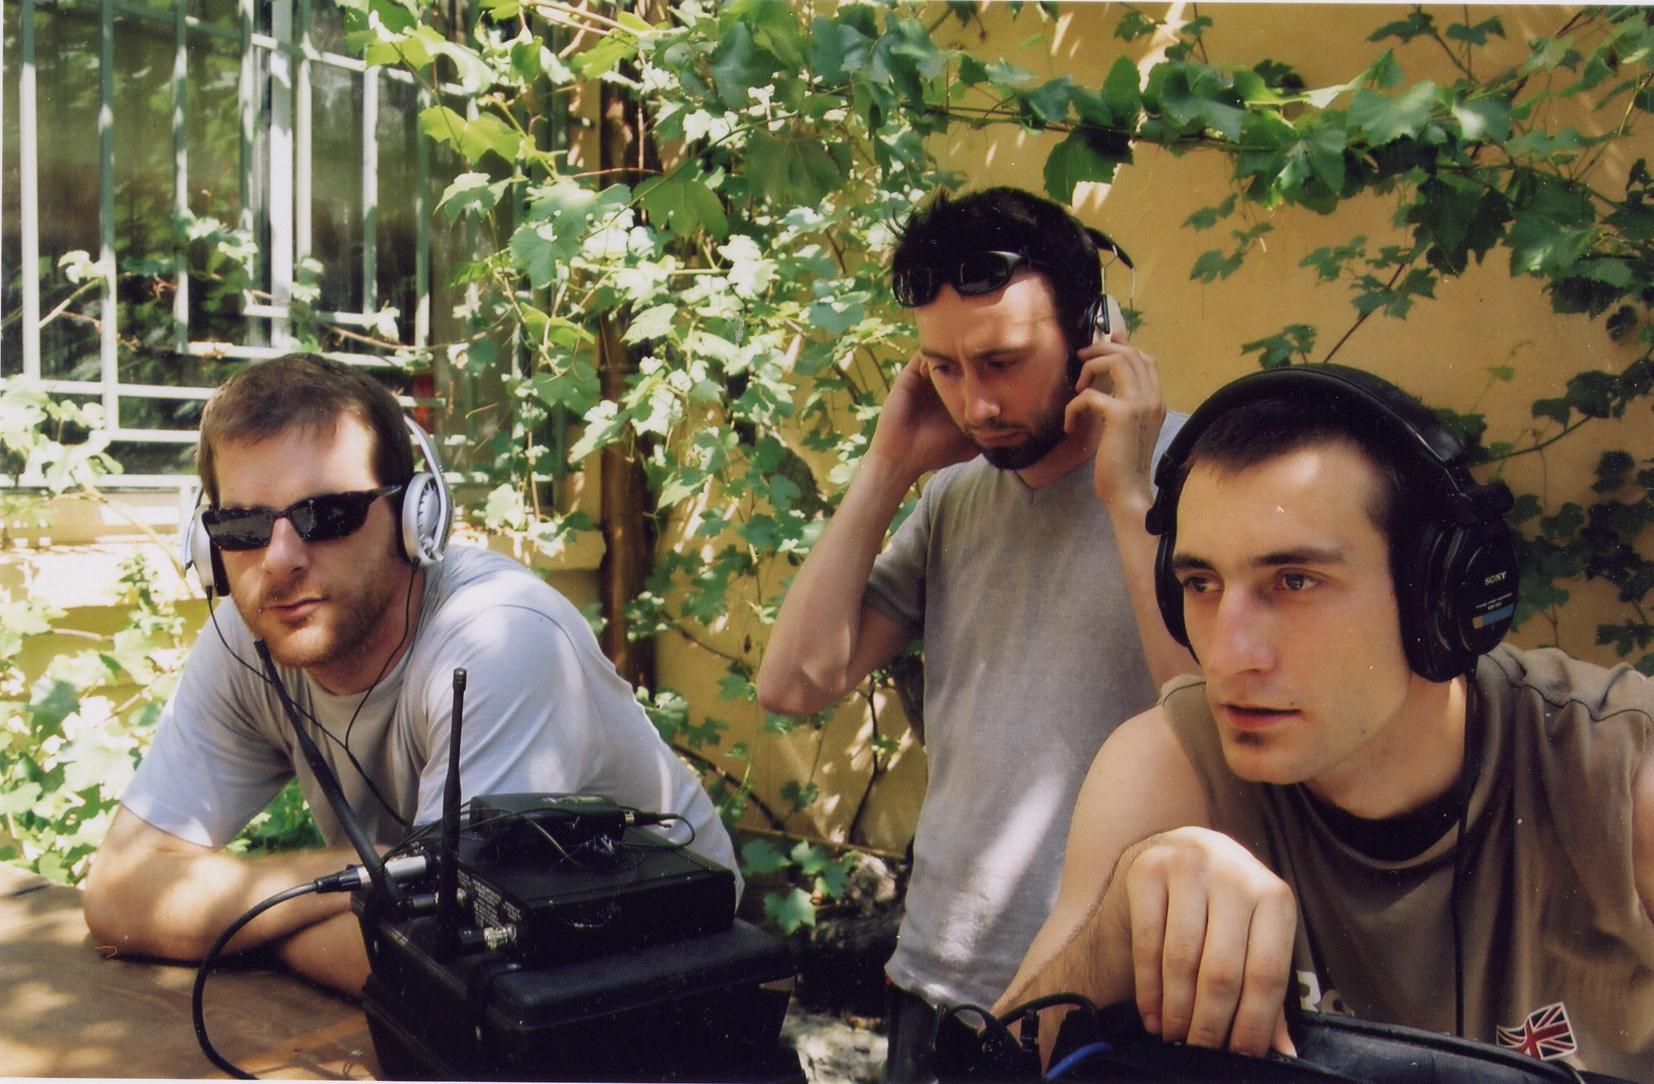 M. Roche, M. Manzano, JF Gouilloud